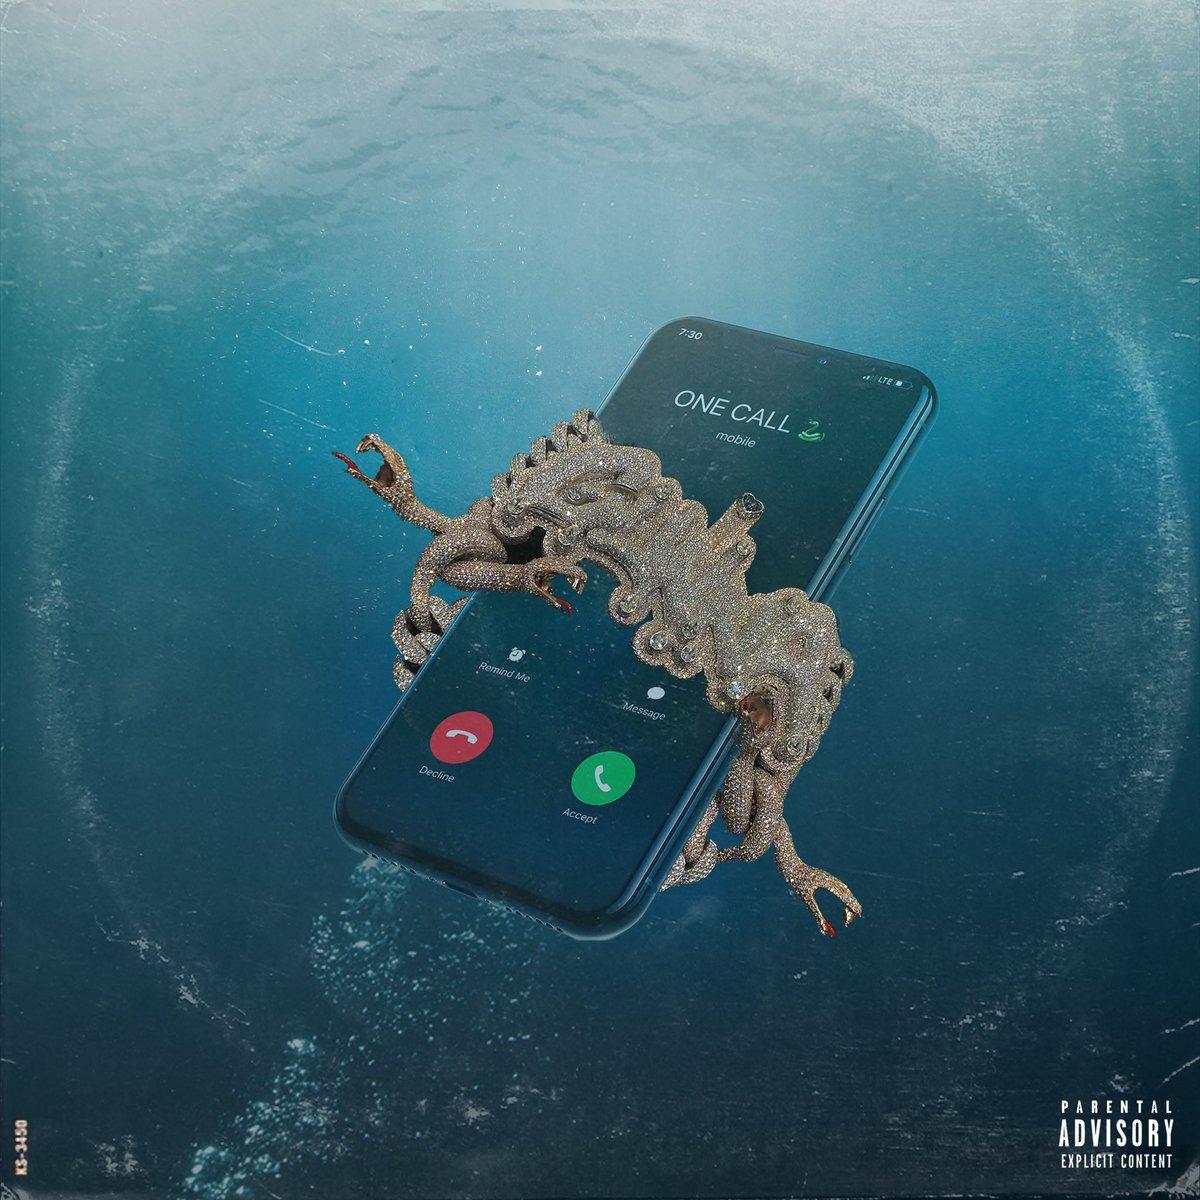 gunna one call